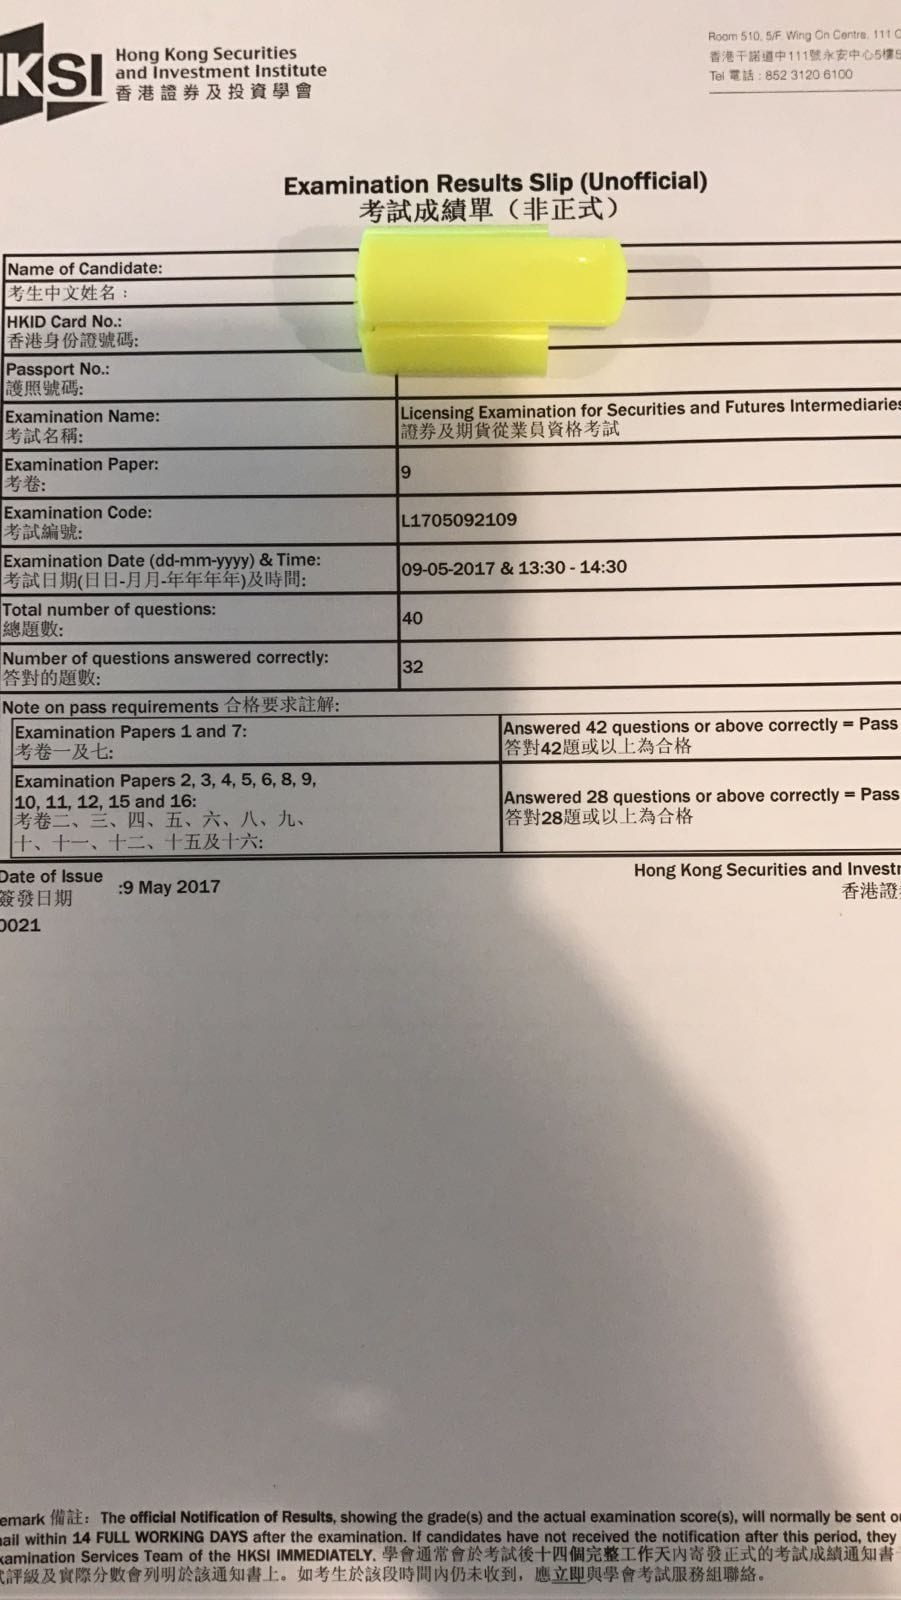 WY 28/10/2016 LE Paper 9 證券期貨從業員資格考試卷九 Pass